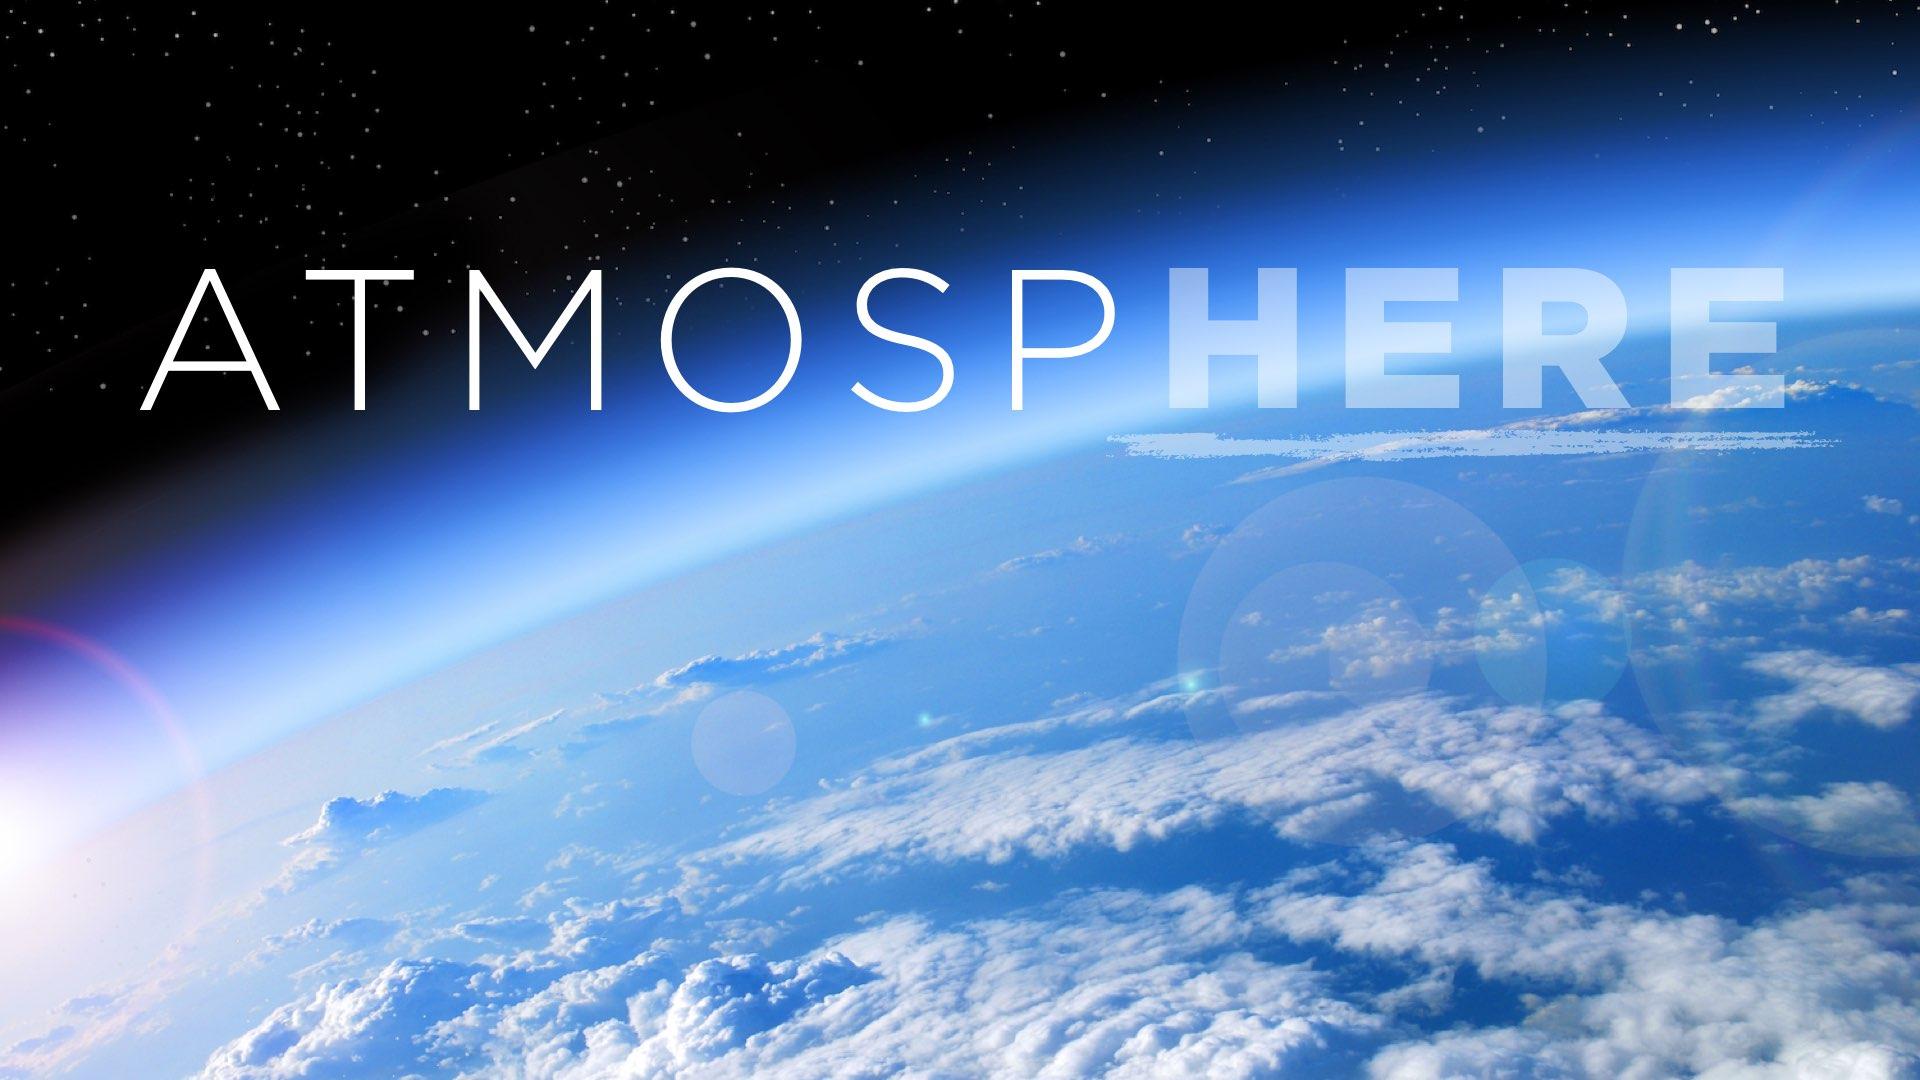 Sermon Series - Atmosphere Title Slide